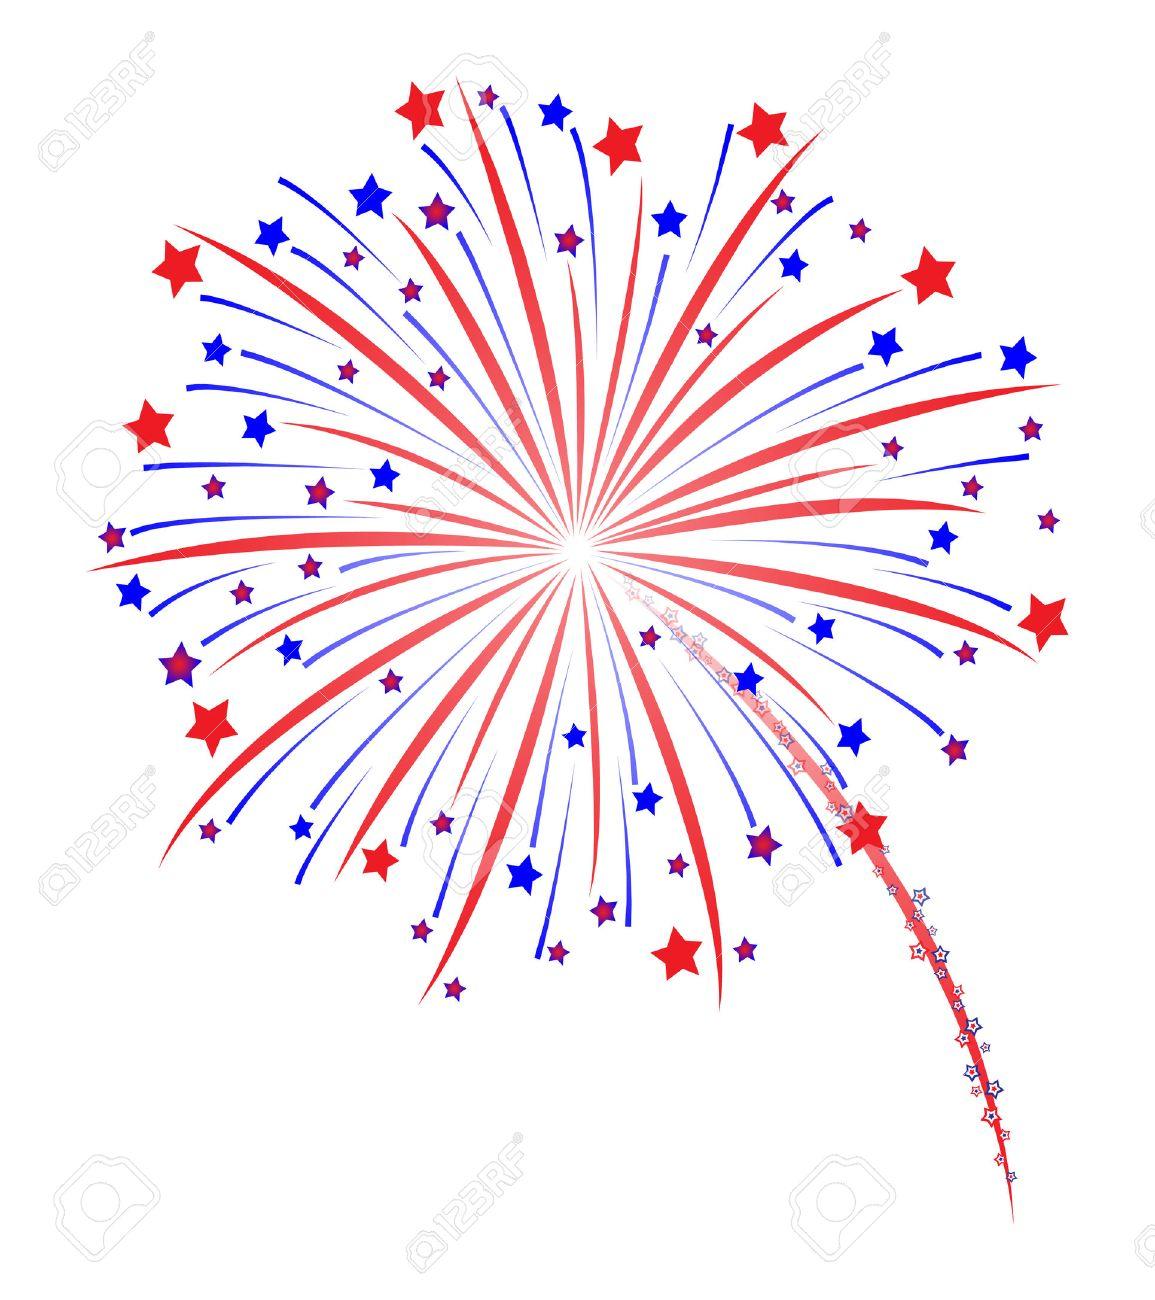 fireworks vector illustration royalty free cliparts vectors and rh 123rf com vector fireworks free Fireworks No Background